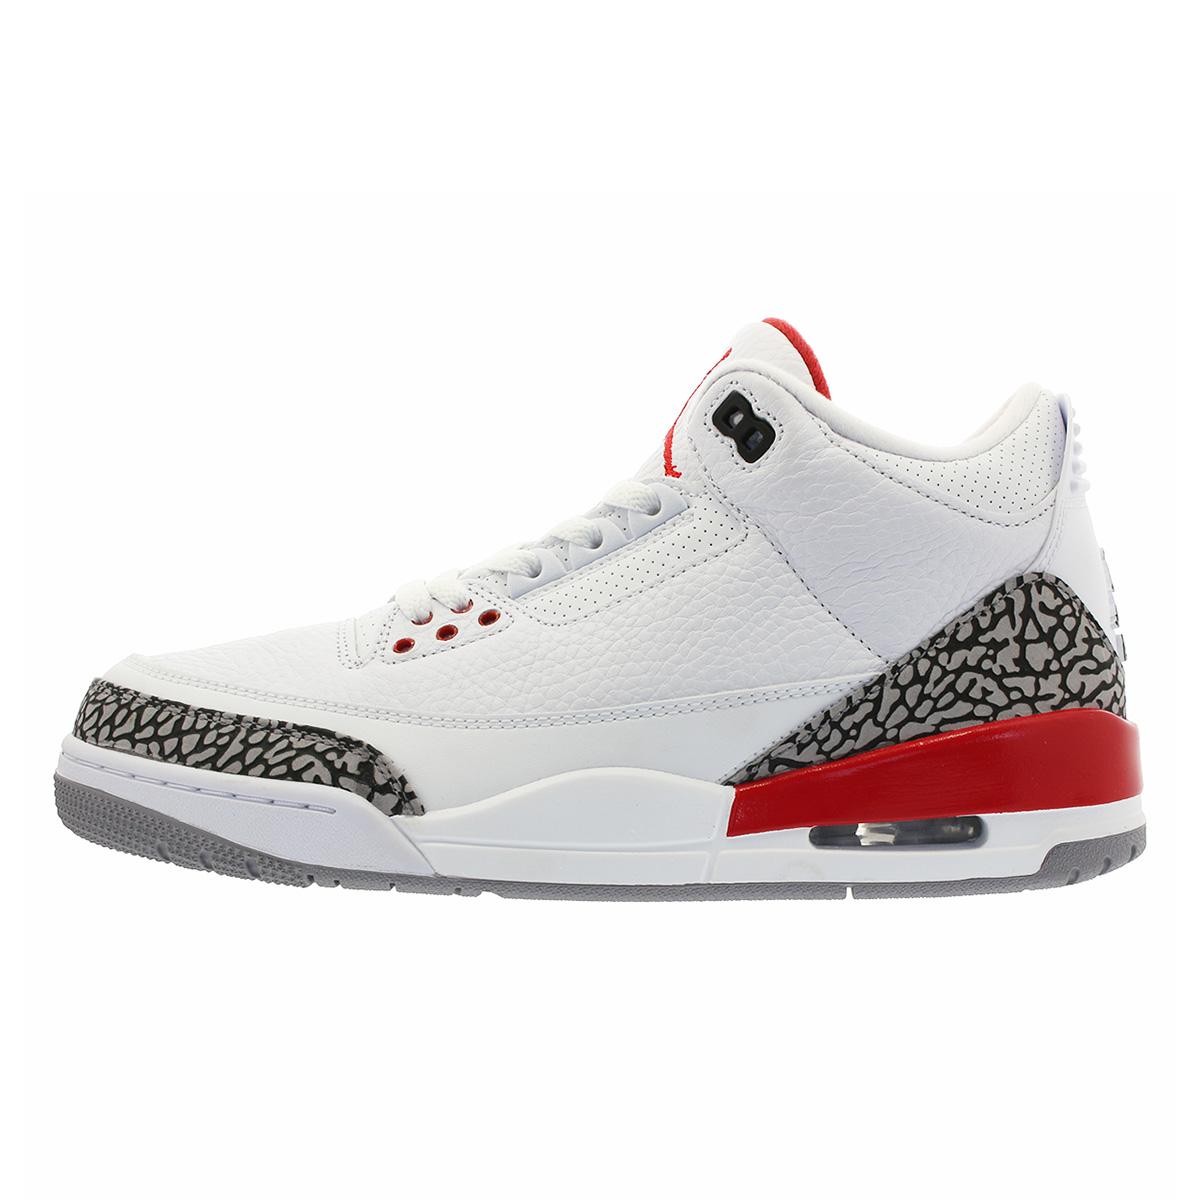 fef6164a6bbc5 NIKE AIR JORDAN 3 RETRO Nike Air Jordan 3 nostalgic WHITE CEMENT GREY FIRE  RED 136